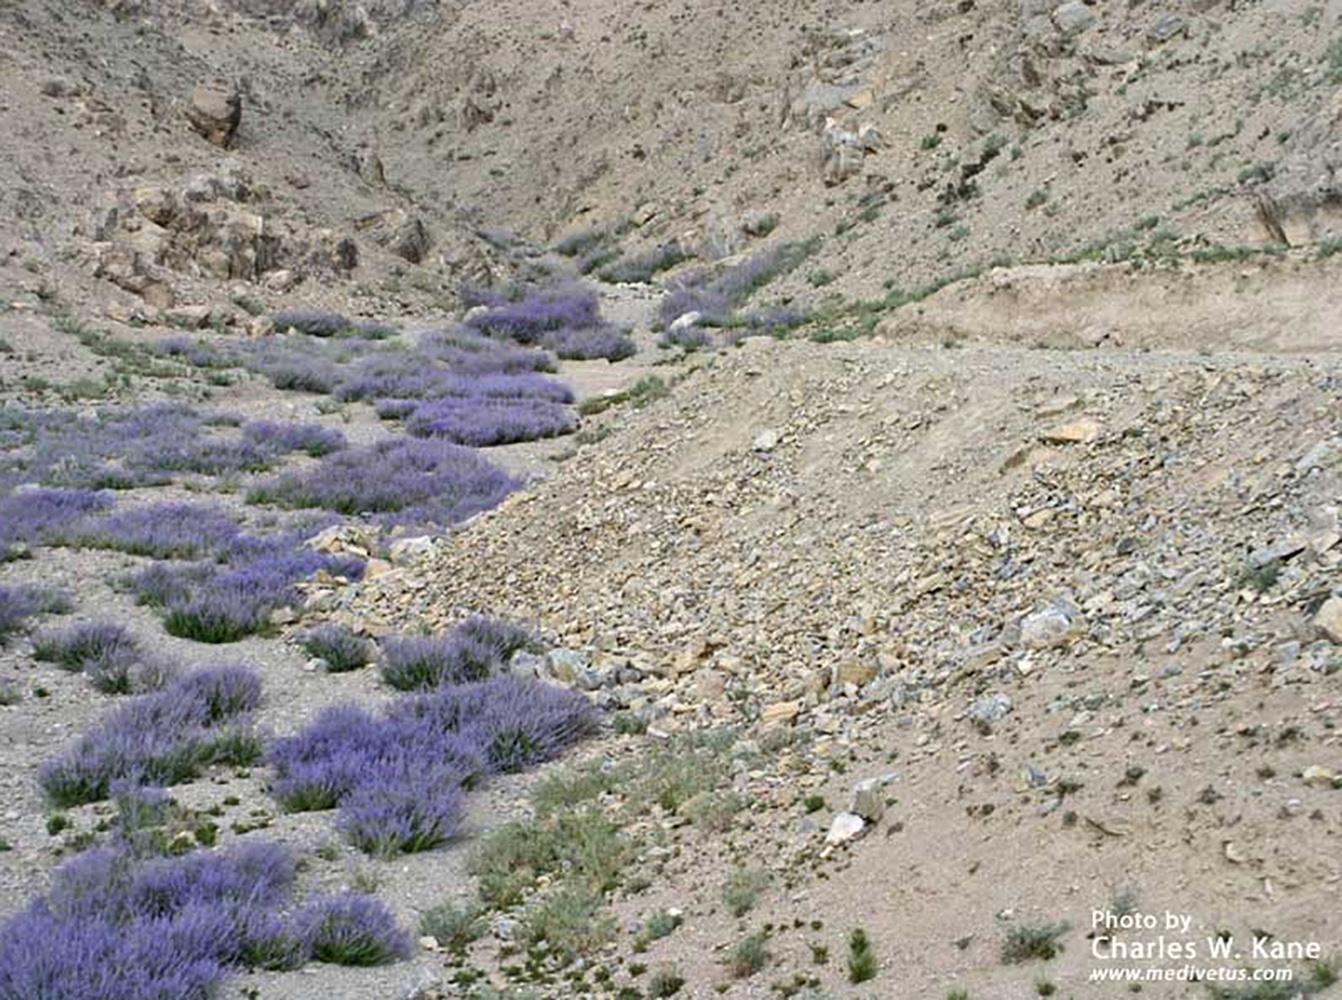 perovskia-atriplicifolia-_-russian-sage-_-medicinal-uses-_-charles-w-kane-_-applied-medical-botany-2